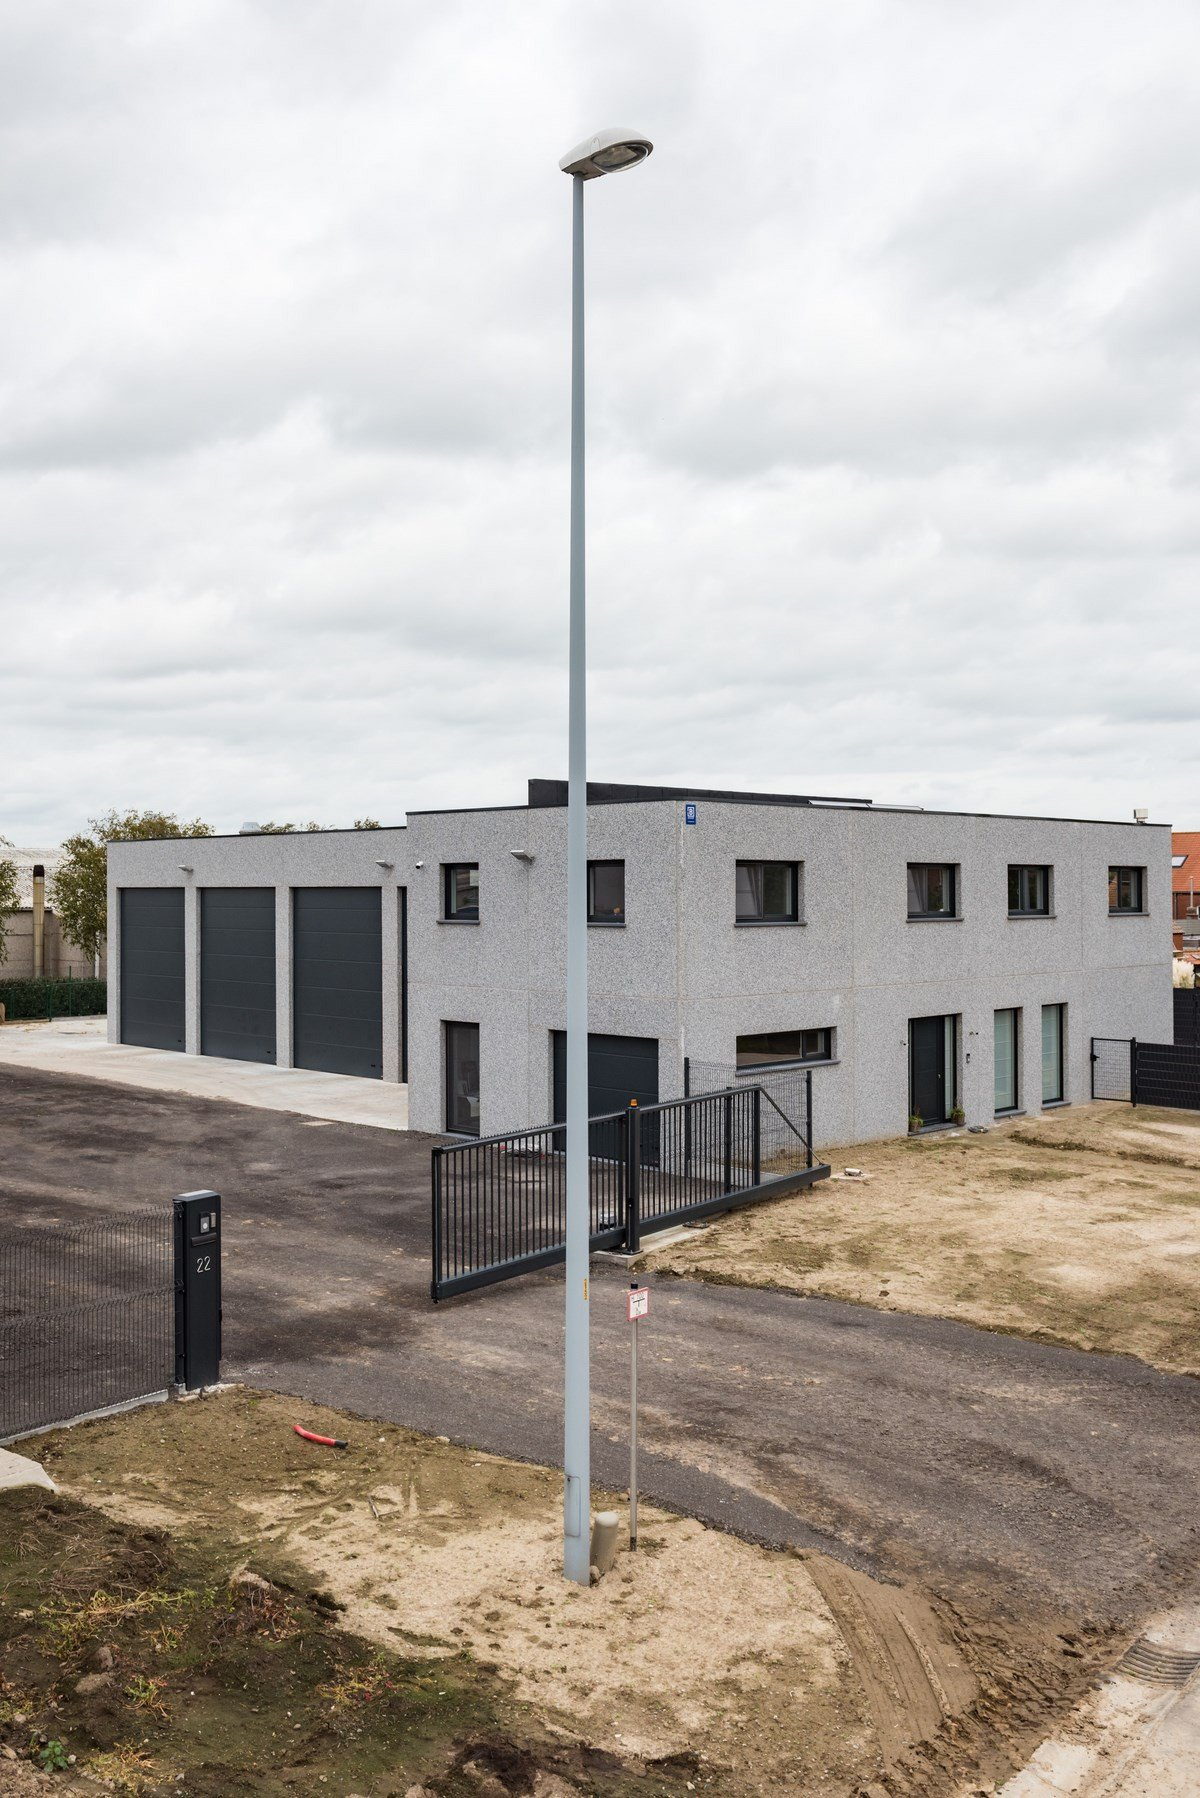 Beeuwsaert_industriegebouw_woning (1).jpg